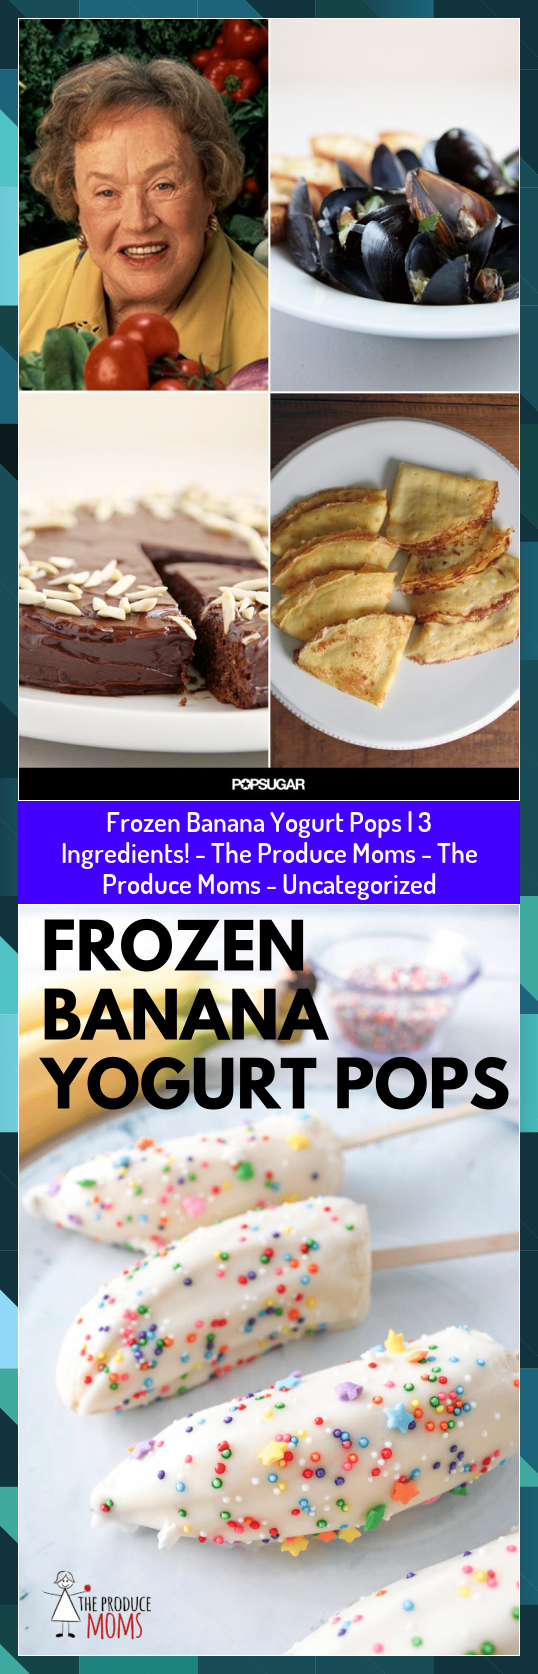 Frozen Banana Yogurt Pops  3 Ingredients  The Produce Moms  The Produce Moms  Uncategorized